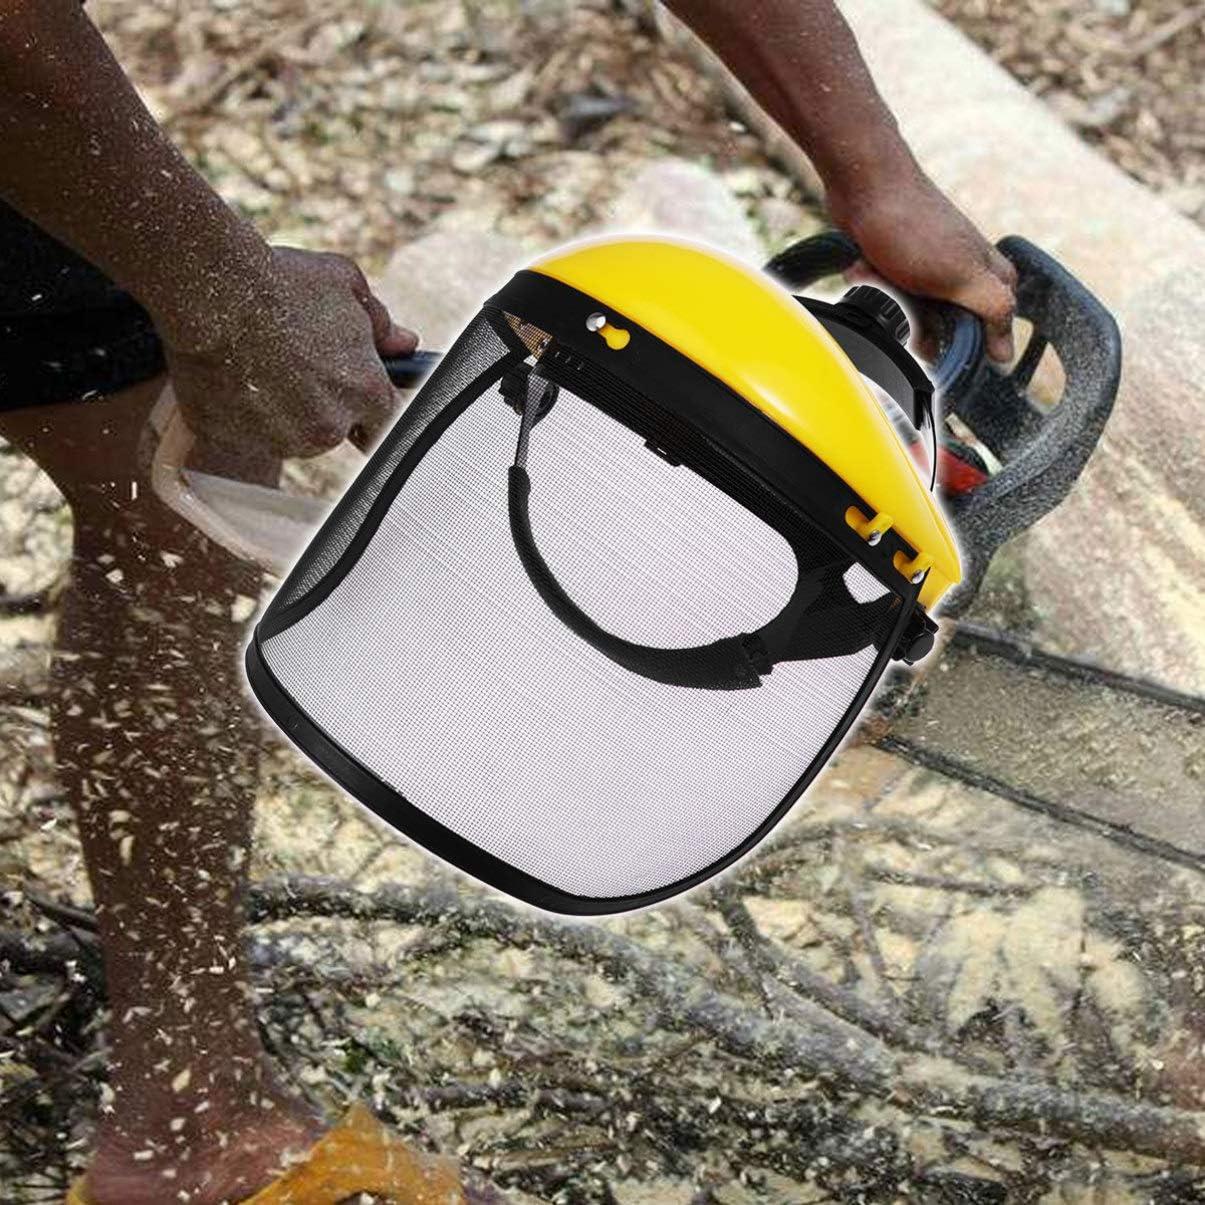 Hemoton Protective Face Sheld Equipment Safety Helmet Headgear Welding Grinding Cutting Face Shield Visor with Ratchet Head Gear